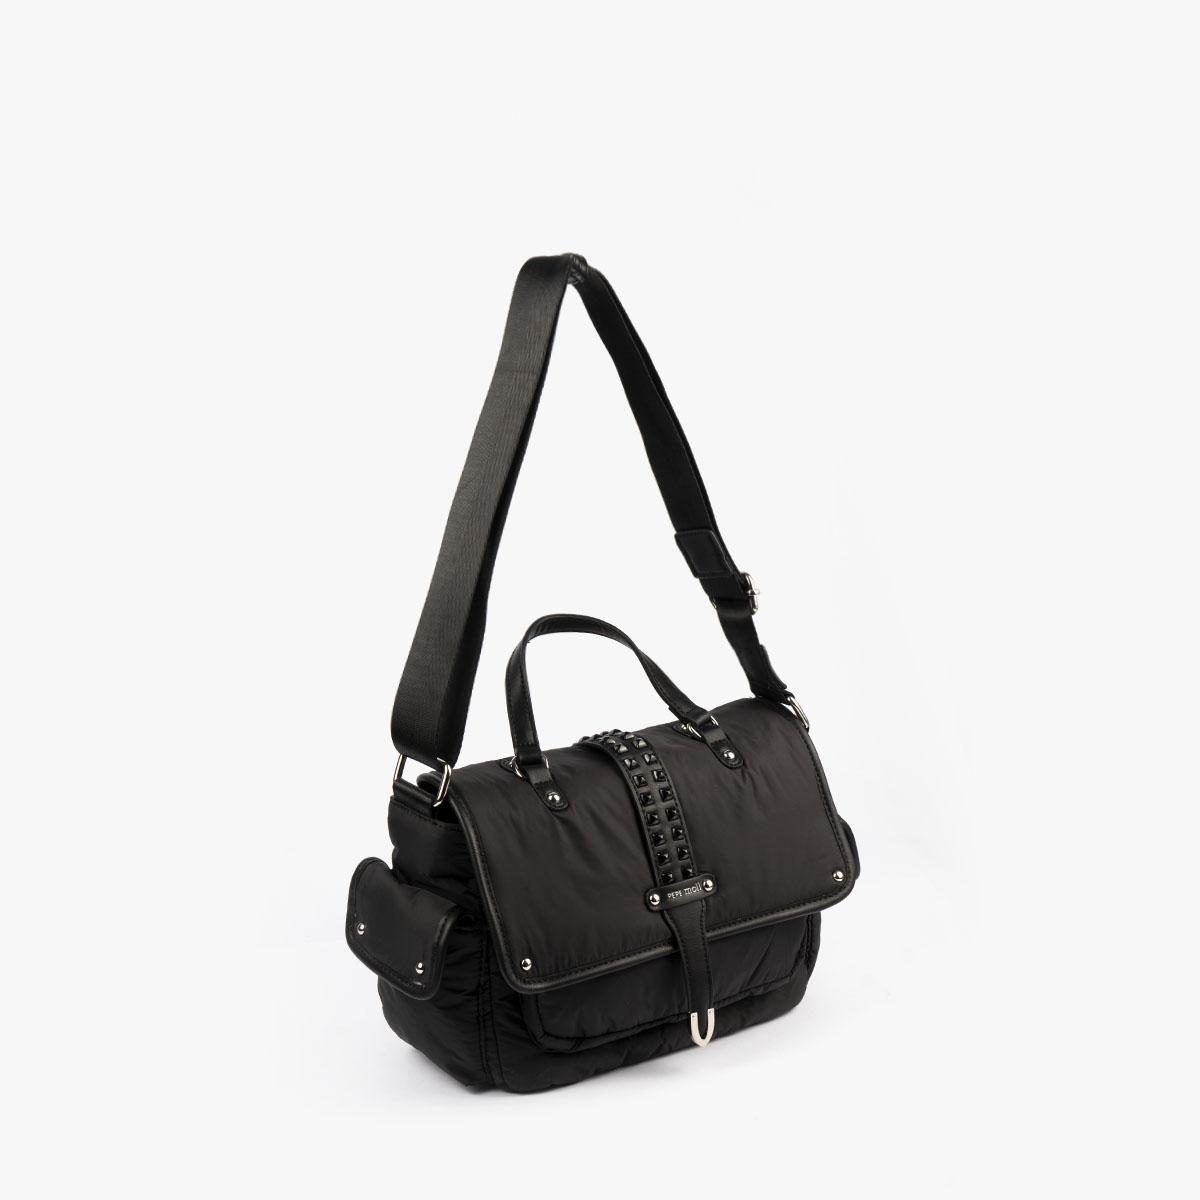 20126 bolso bandolera negro pepemoll